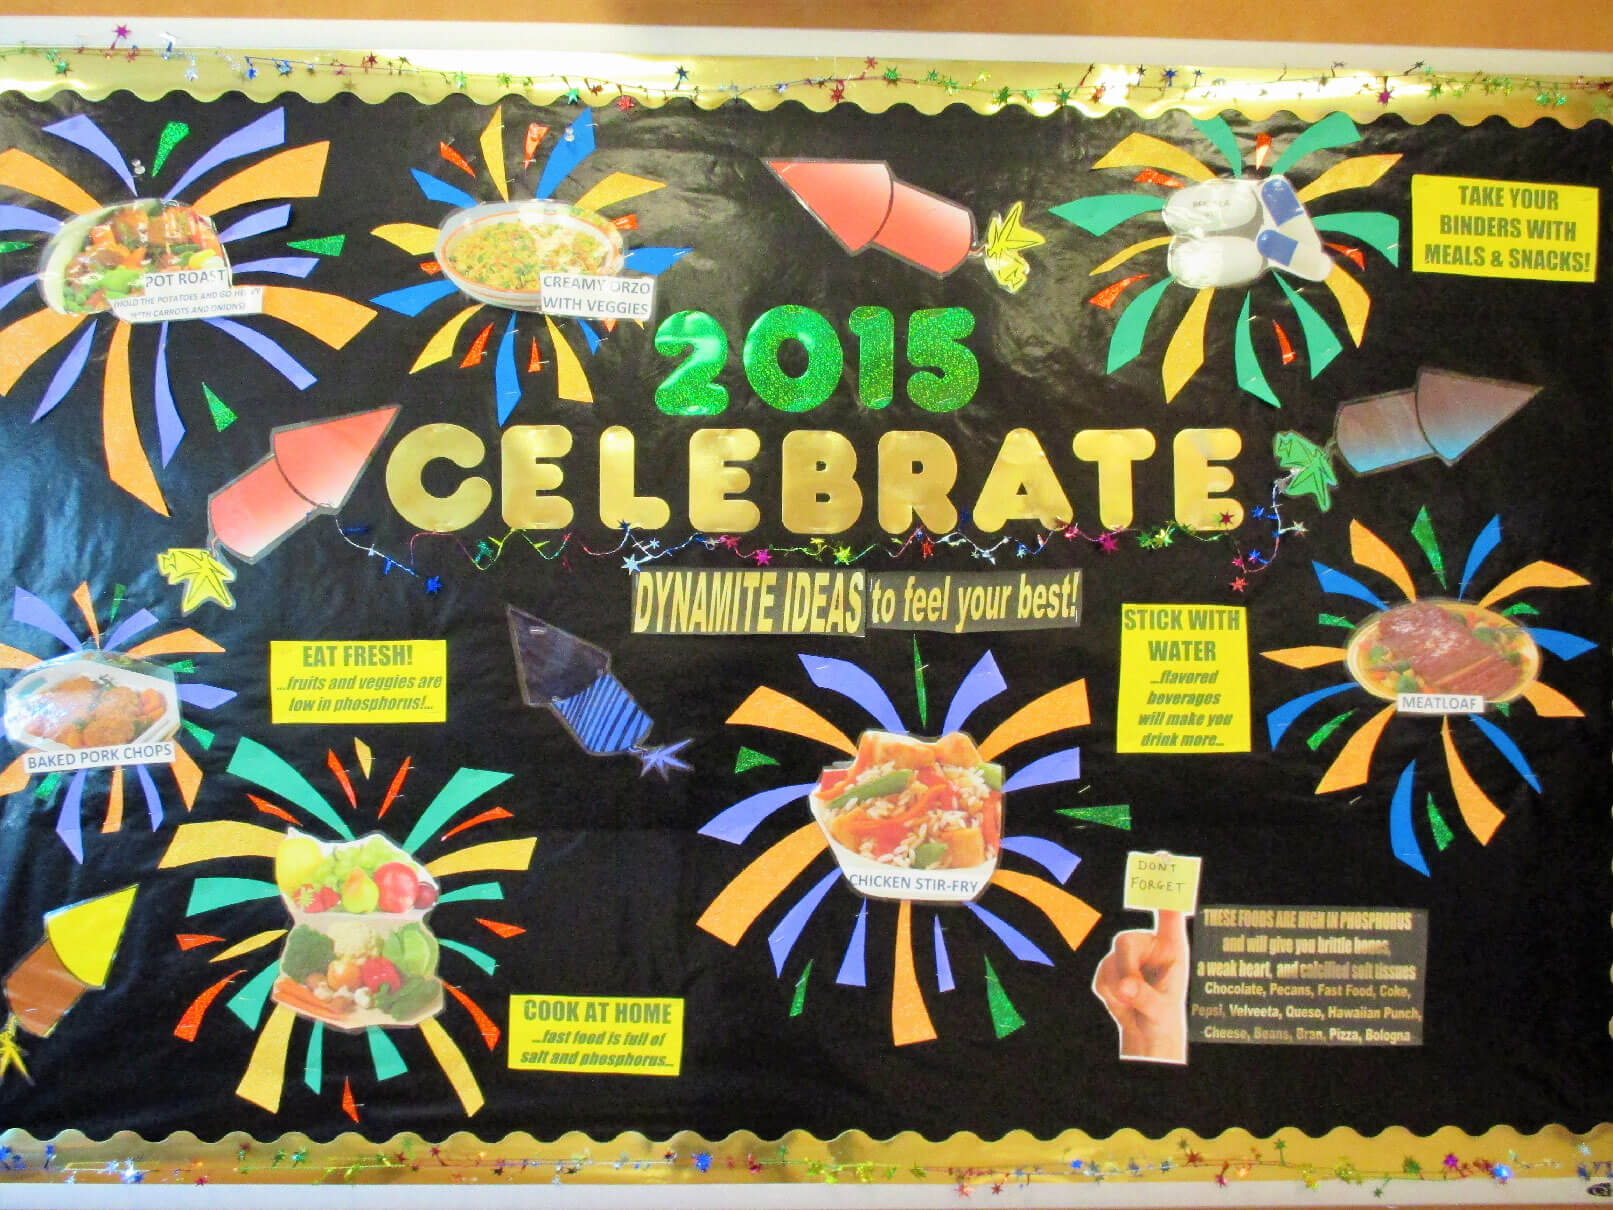 fascinating Winter Bulletin Board Ideas Part - 17: Celebrate u201cdynamiteu201d ideas to feel your best!